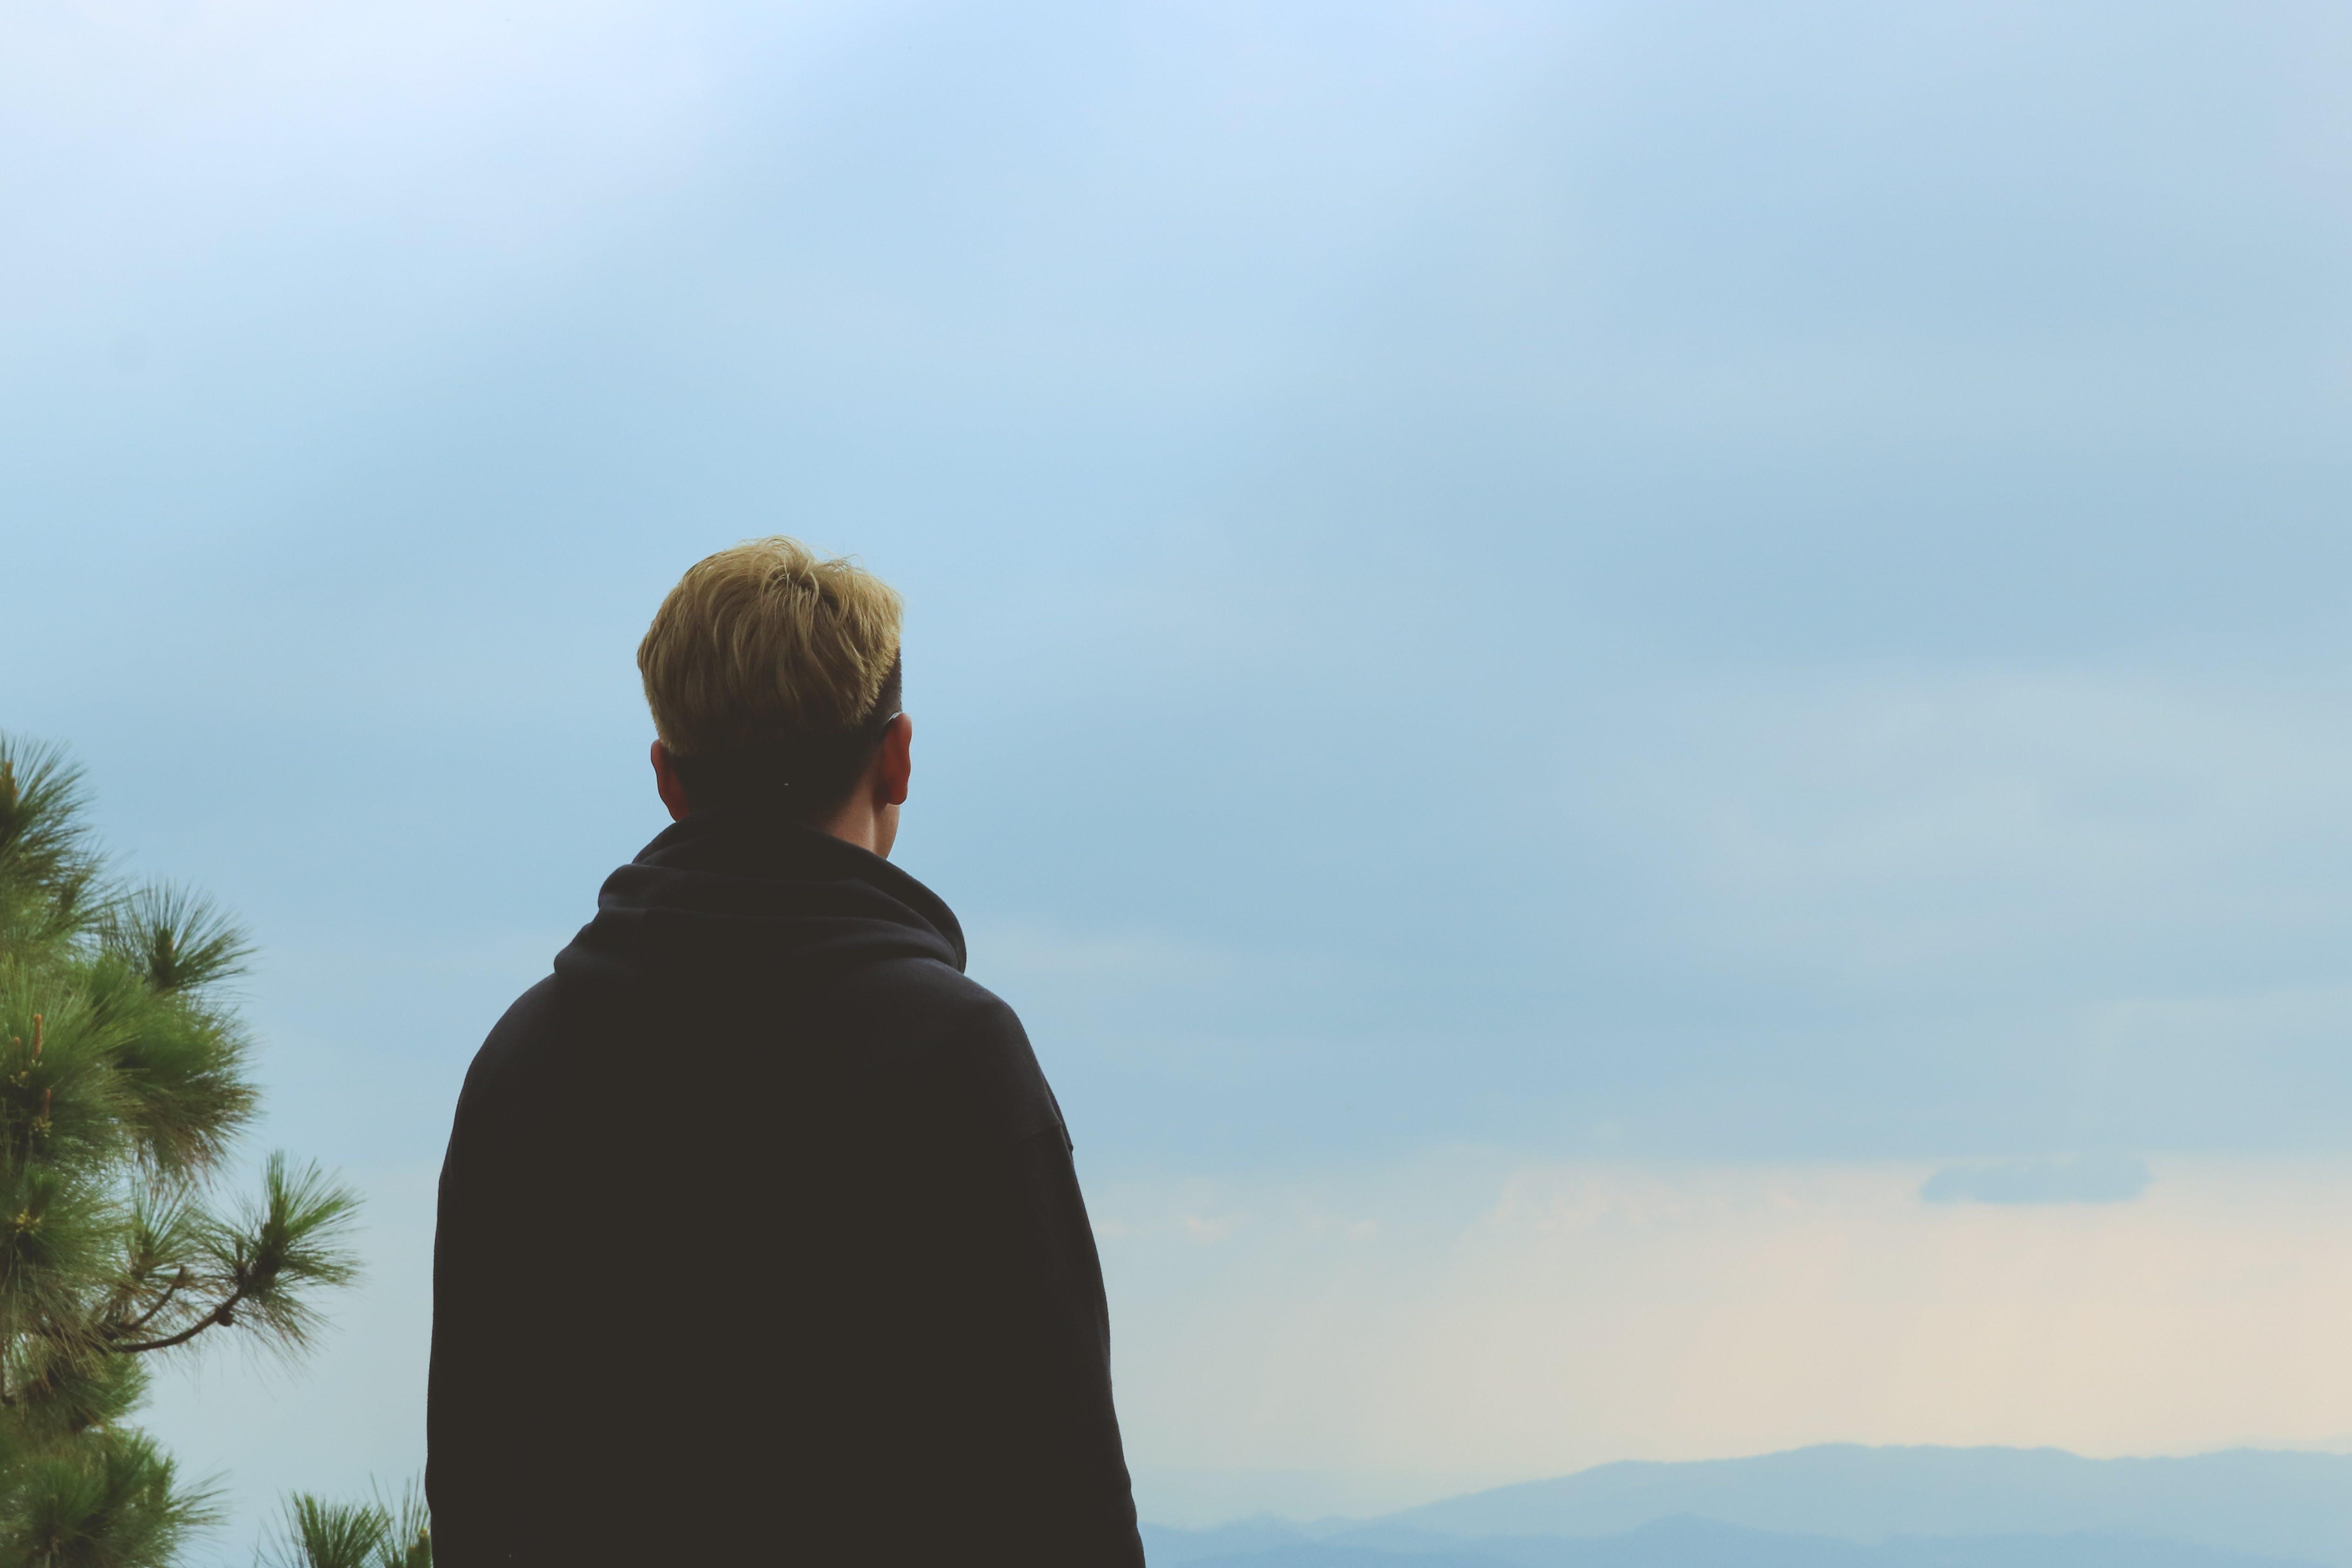 Man Wearing Black Jacket Standing Near Tree